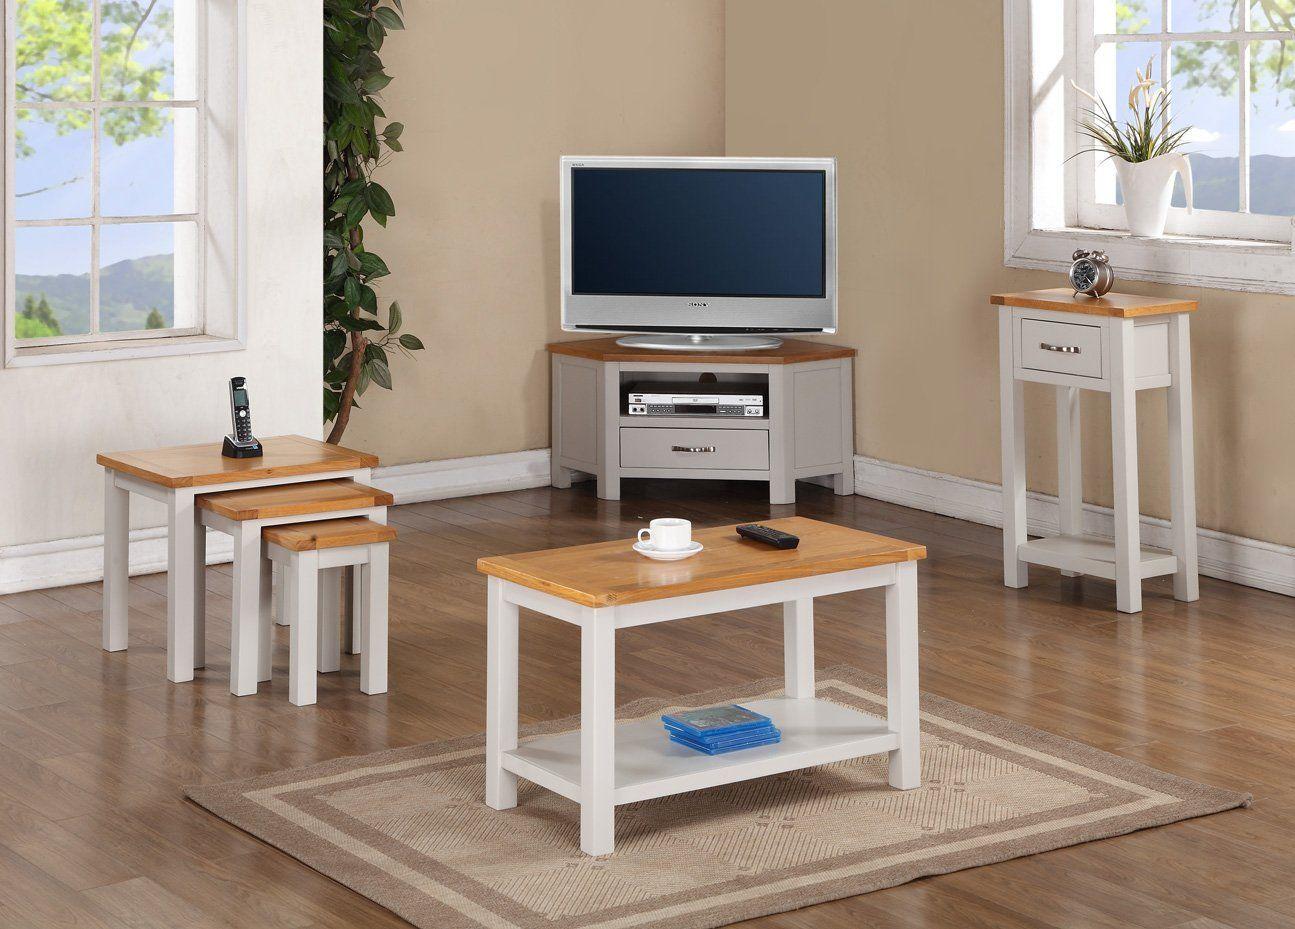 mullion peint meuble tv d'angle chêne: amazon.fr: cuisine & maison